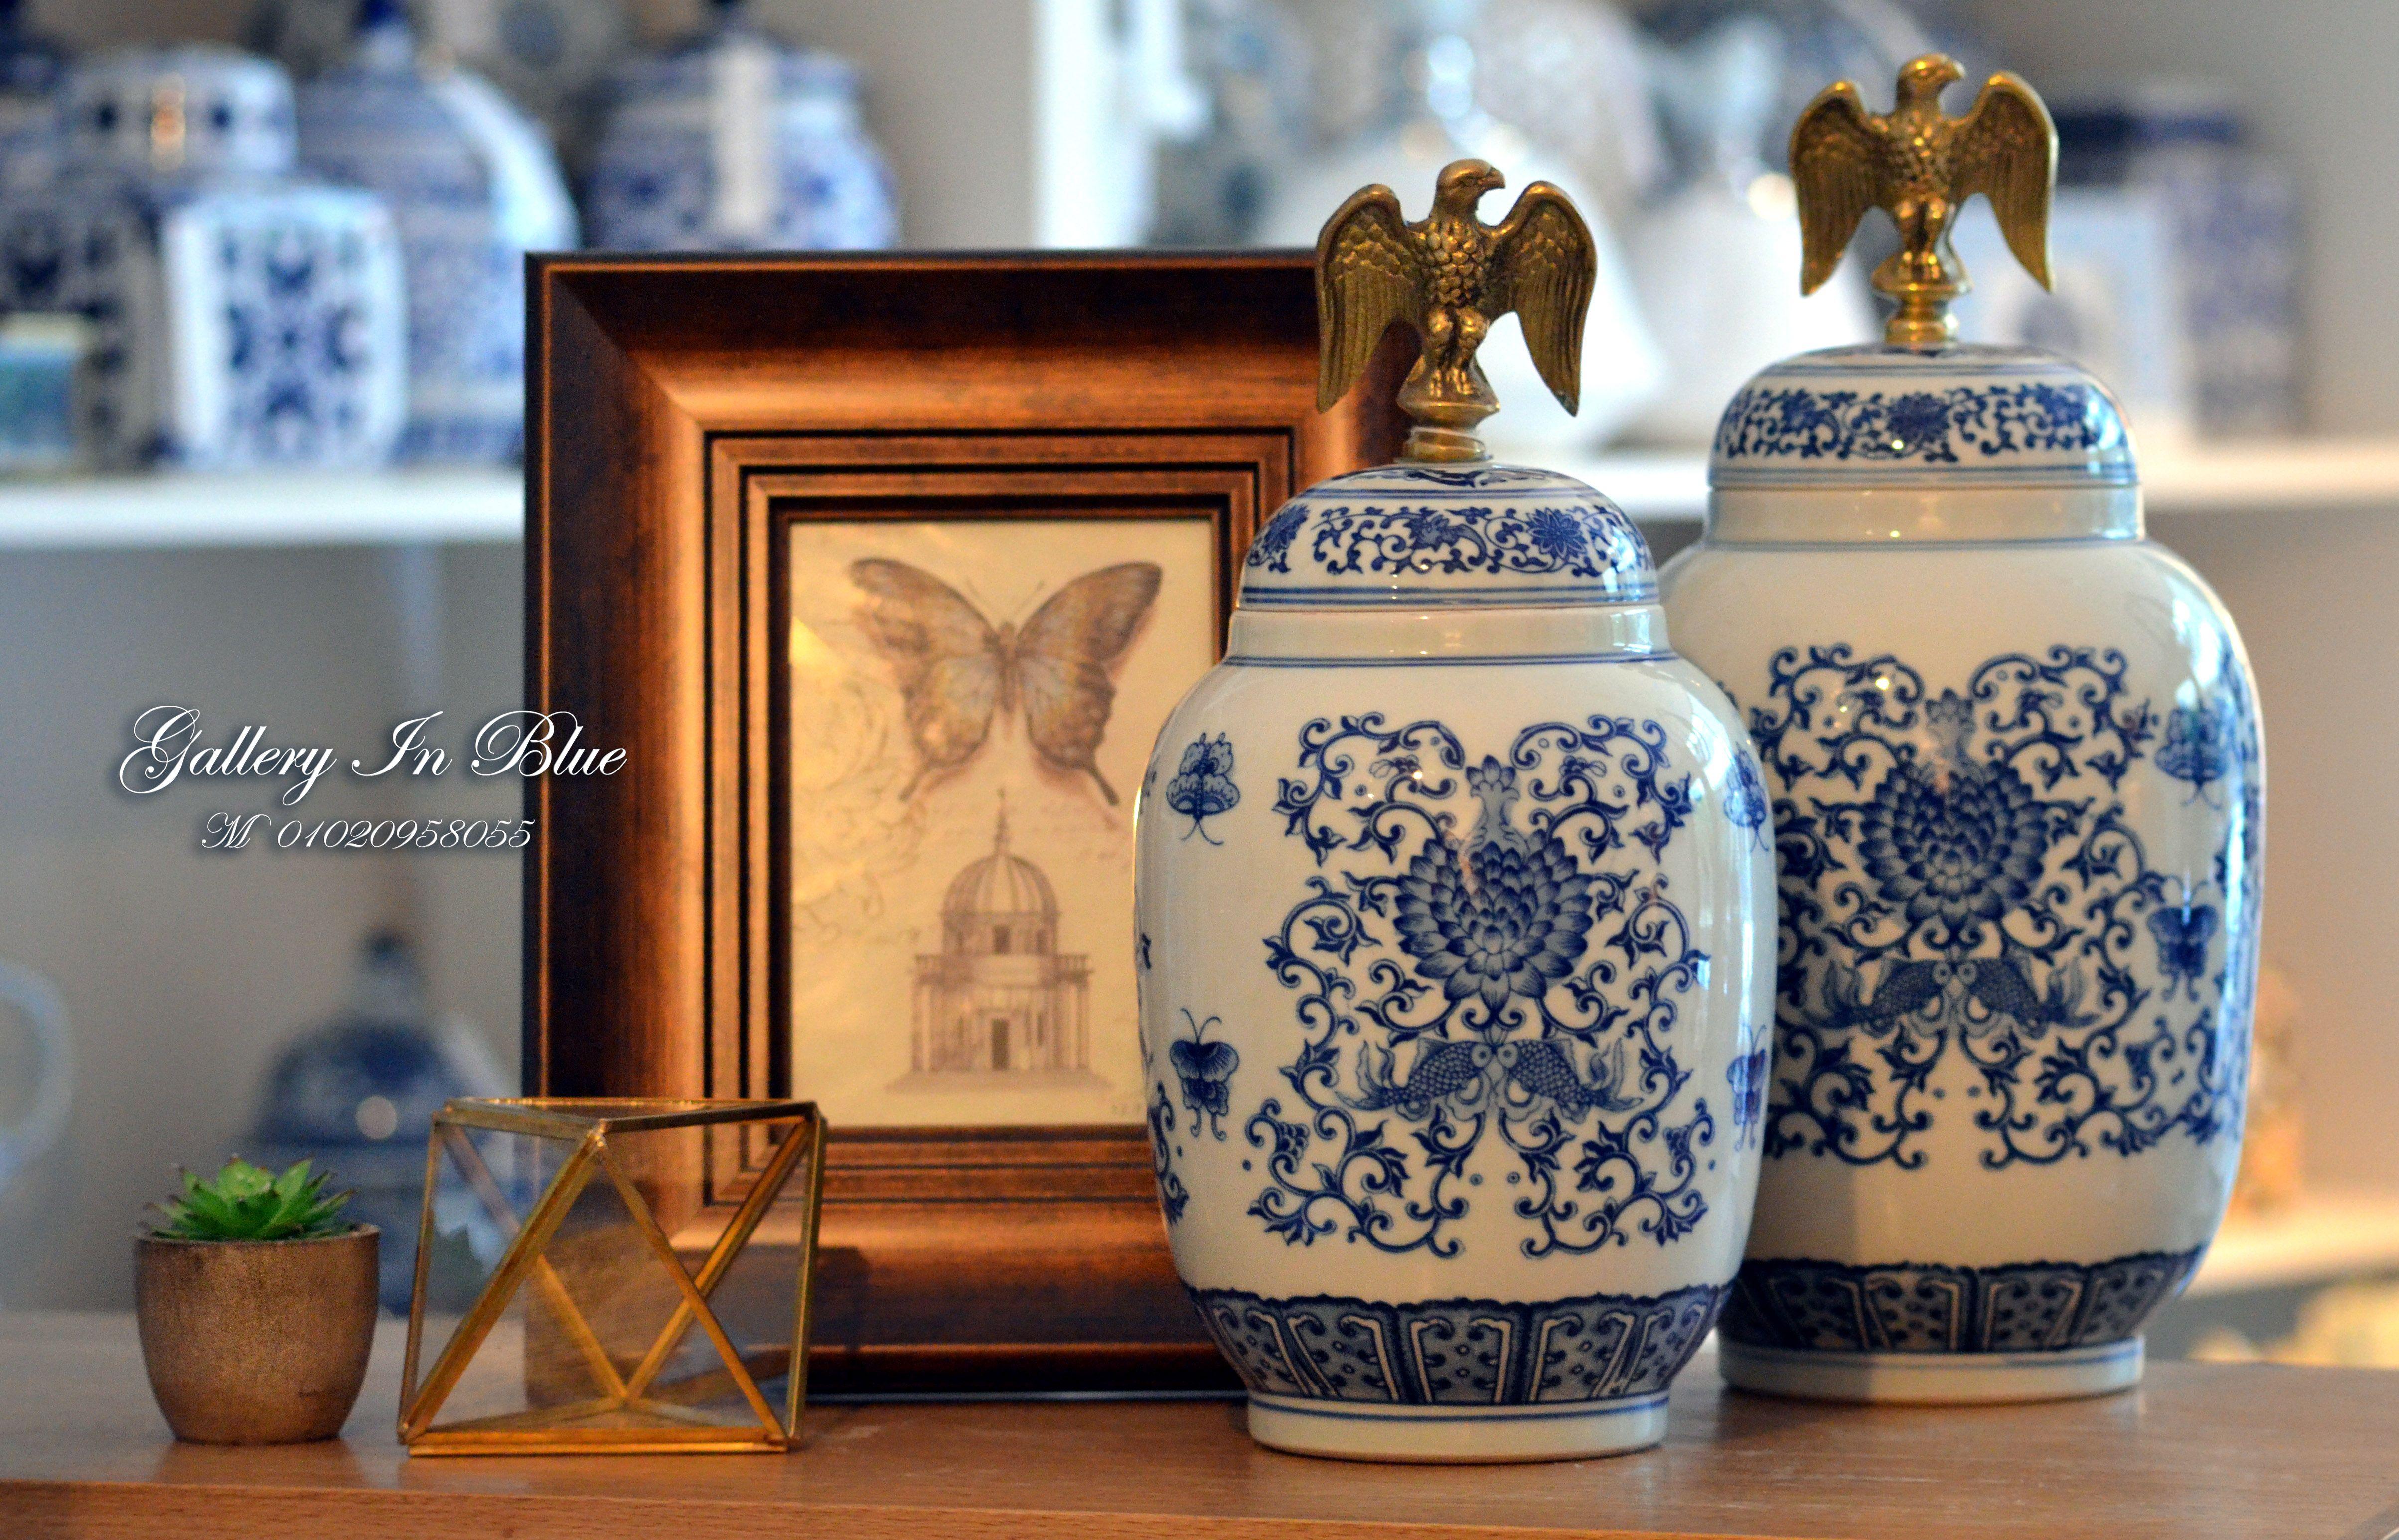 #Galleryinblue #BleuBlanc #Vases #zamalekShops #InteriorDesigenegypt #homeaccessories #Homedecor